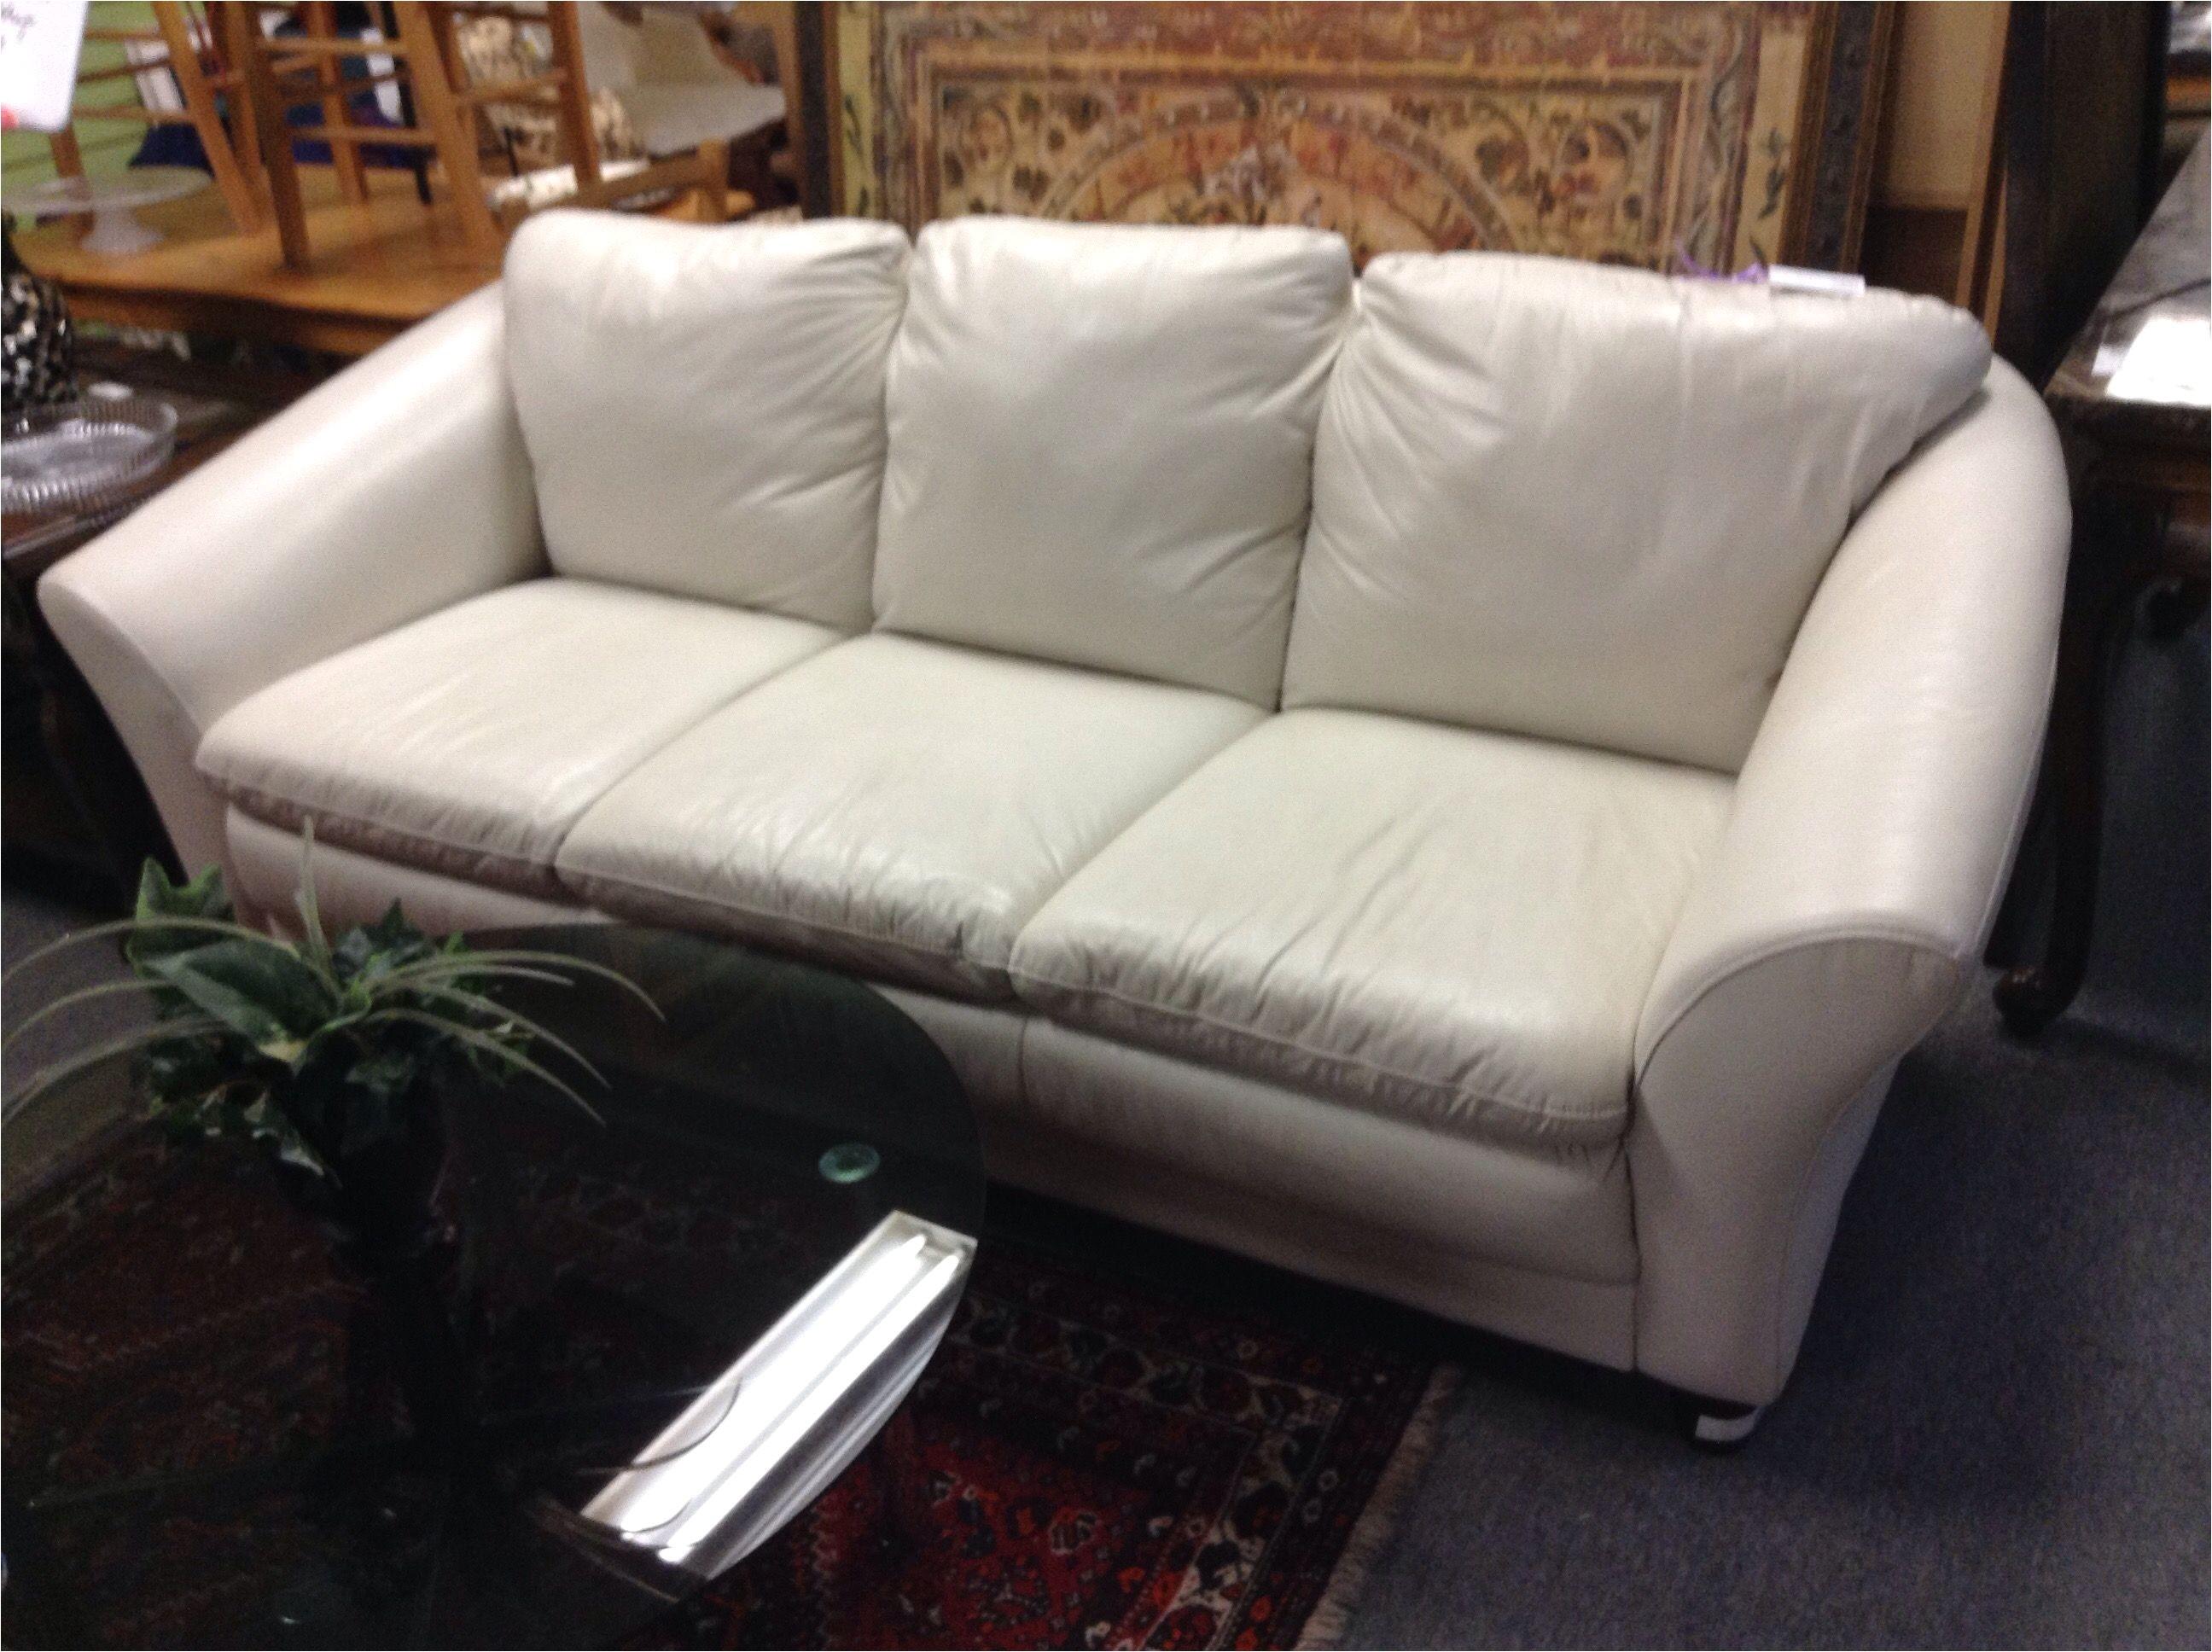 3 seat leather sofa contemporary design sofa in excellent condition item 1206 3